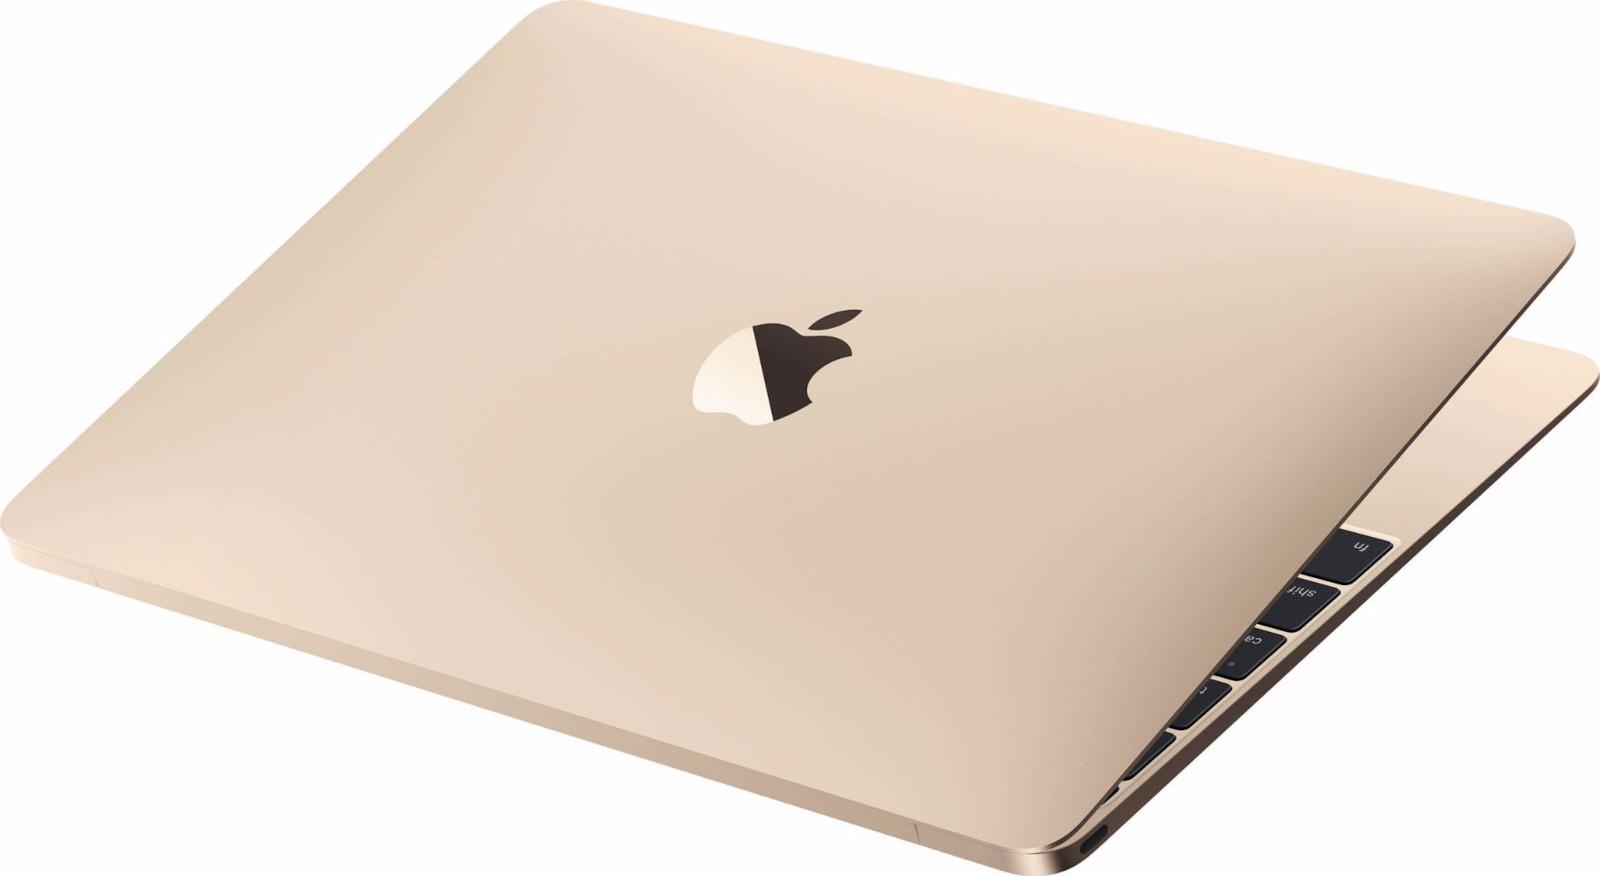 Apple Macbook 12 12ghz Core M 8gb 512gb Ssd 2015 Mf865 Notebook Silver Intel 12inch